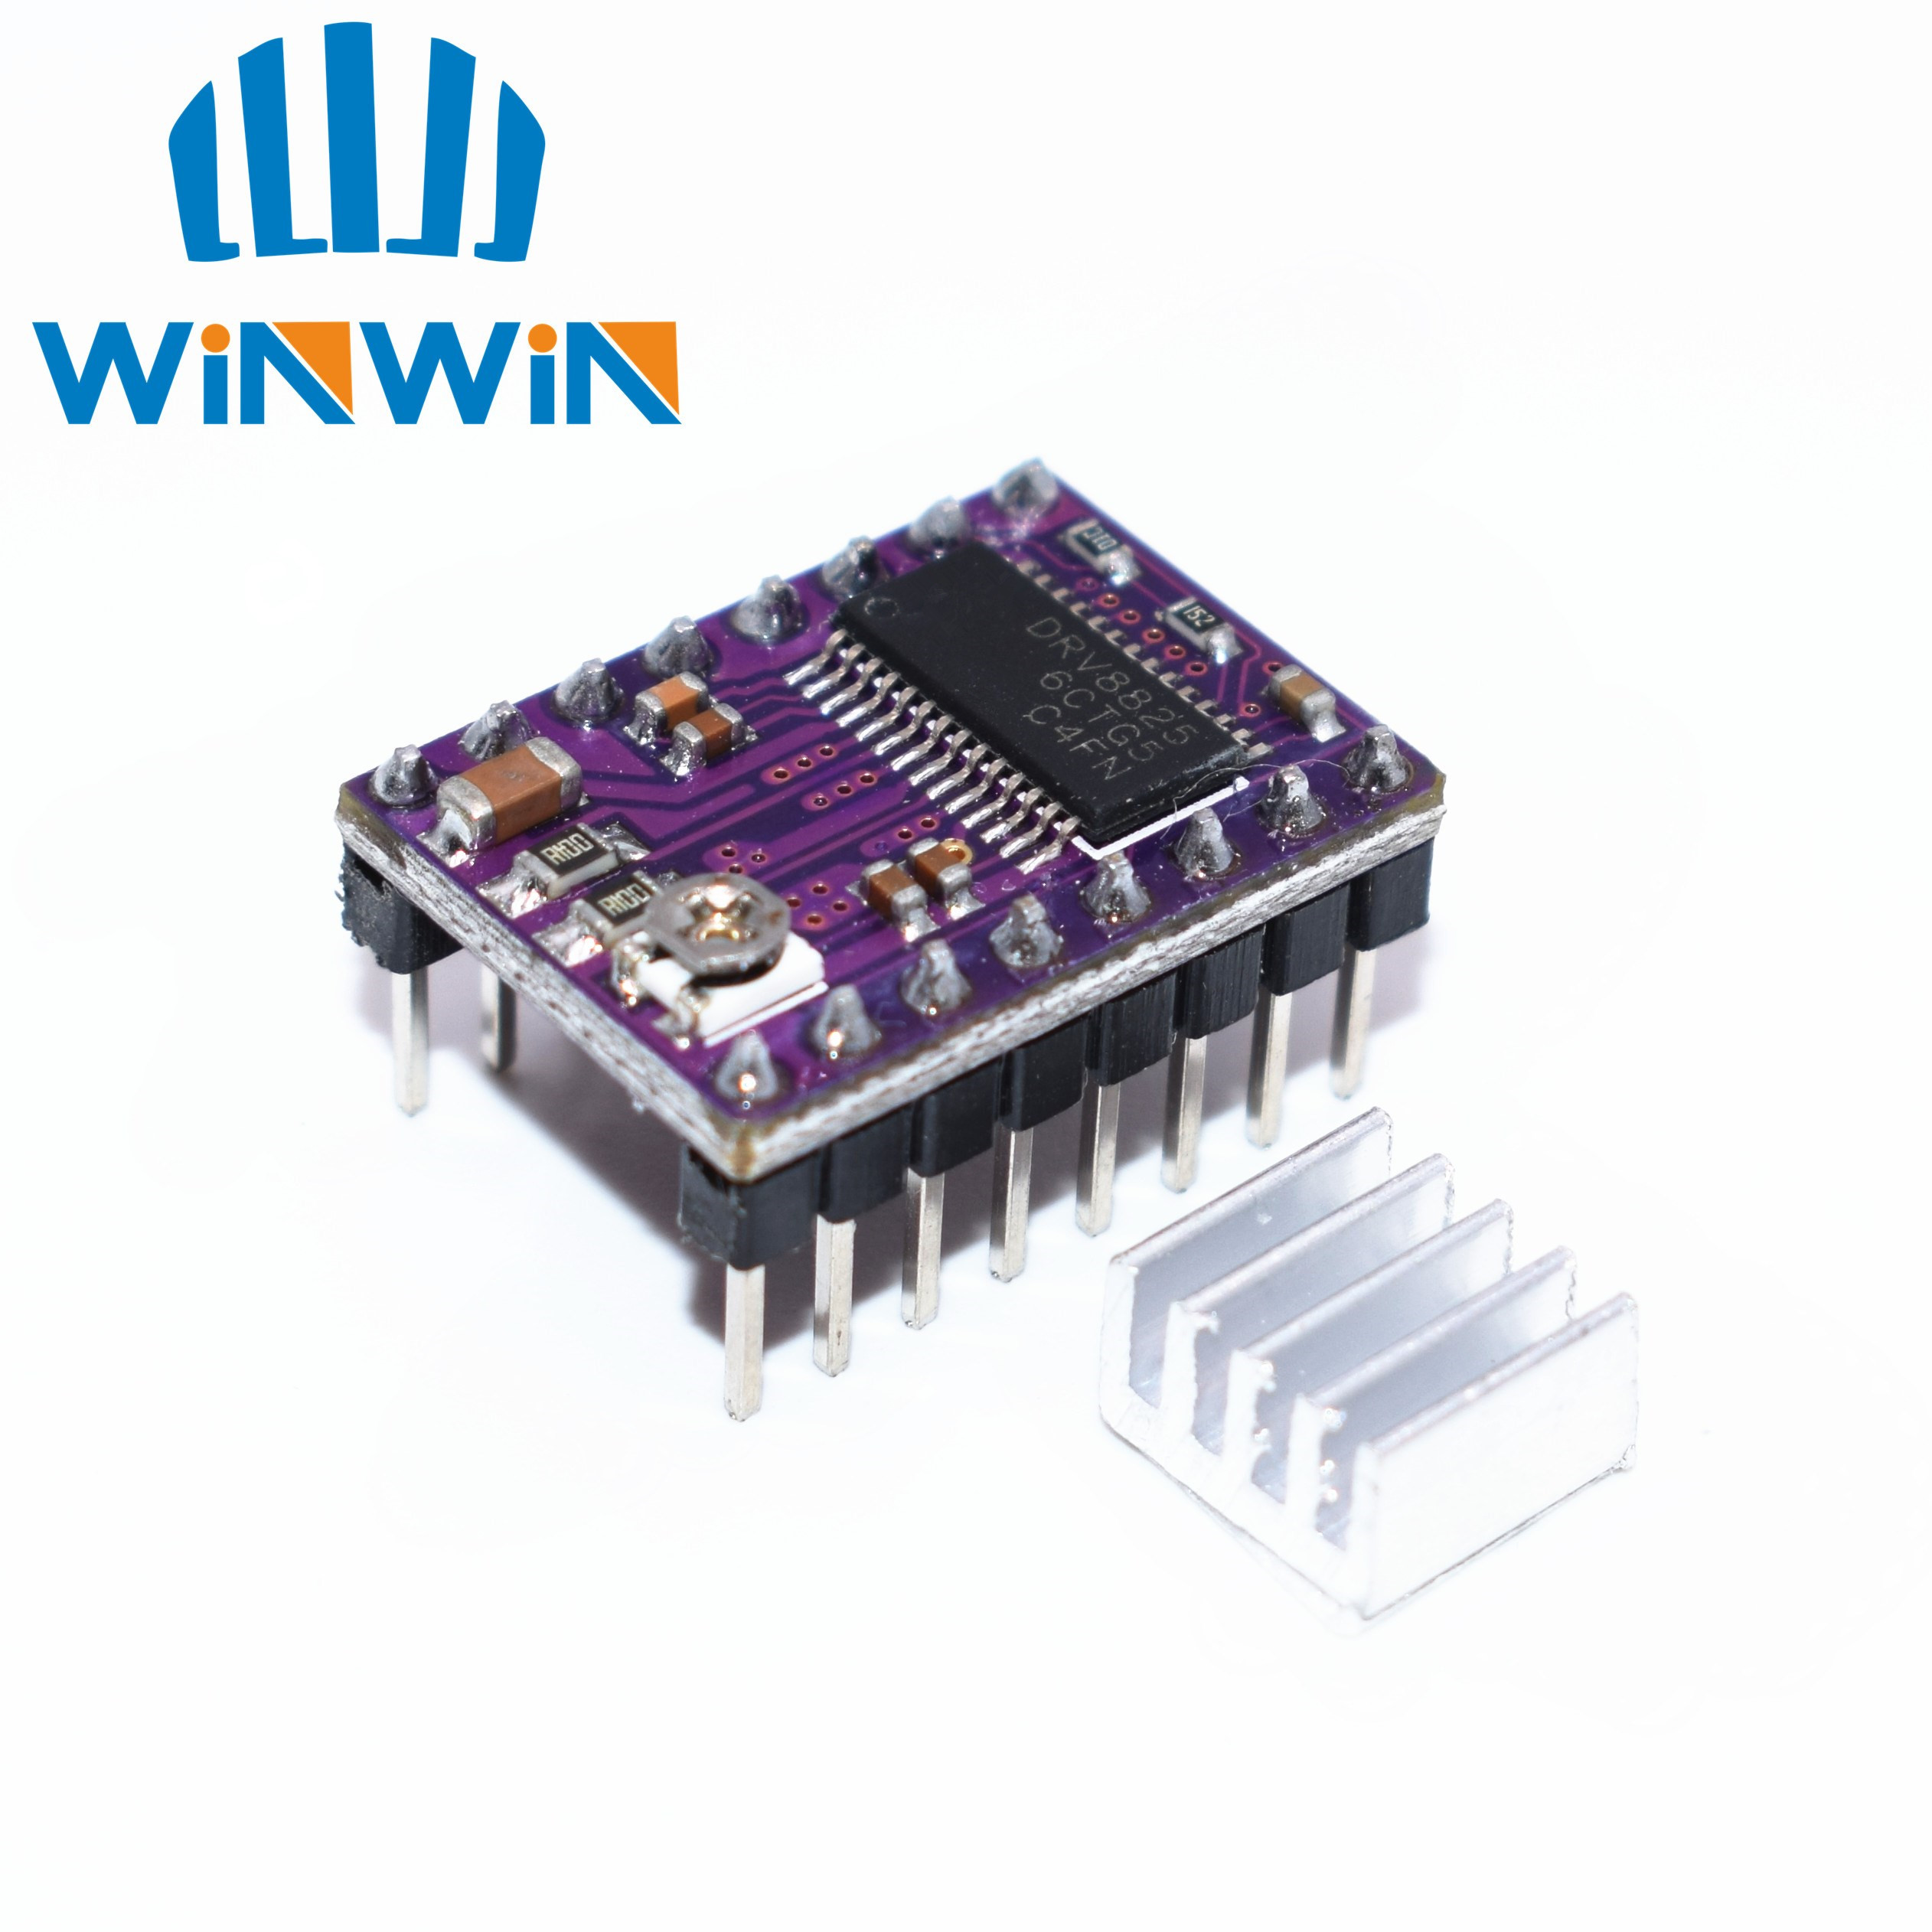 A01 100pcs lot 3D Printer Stepstick Drv8825 Stepper Motor Driver Reprap 4 PCB Board